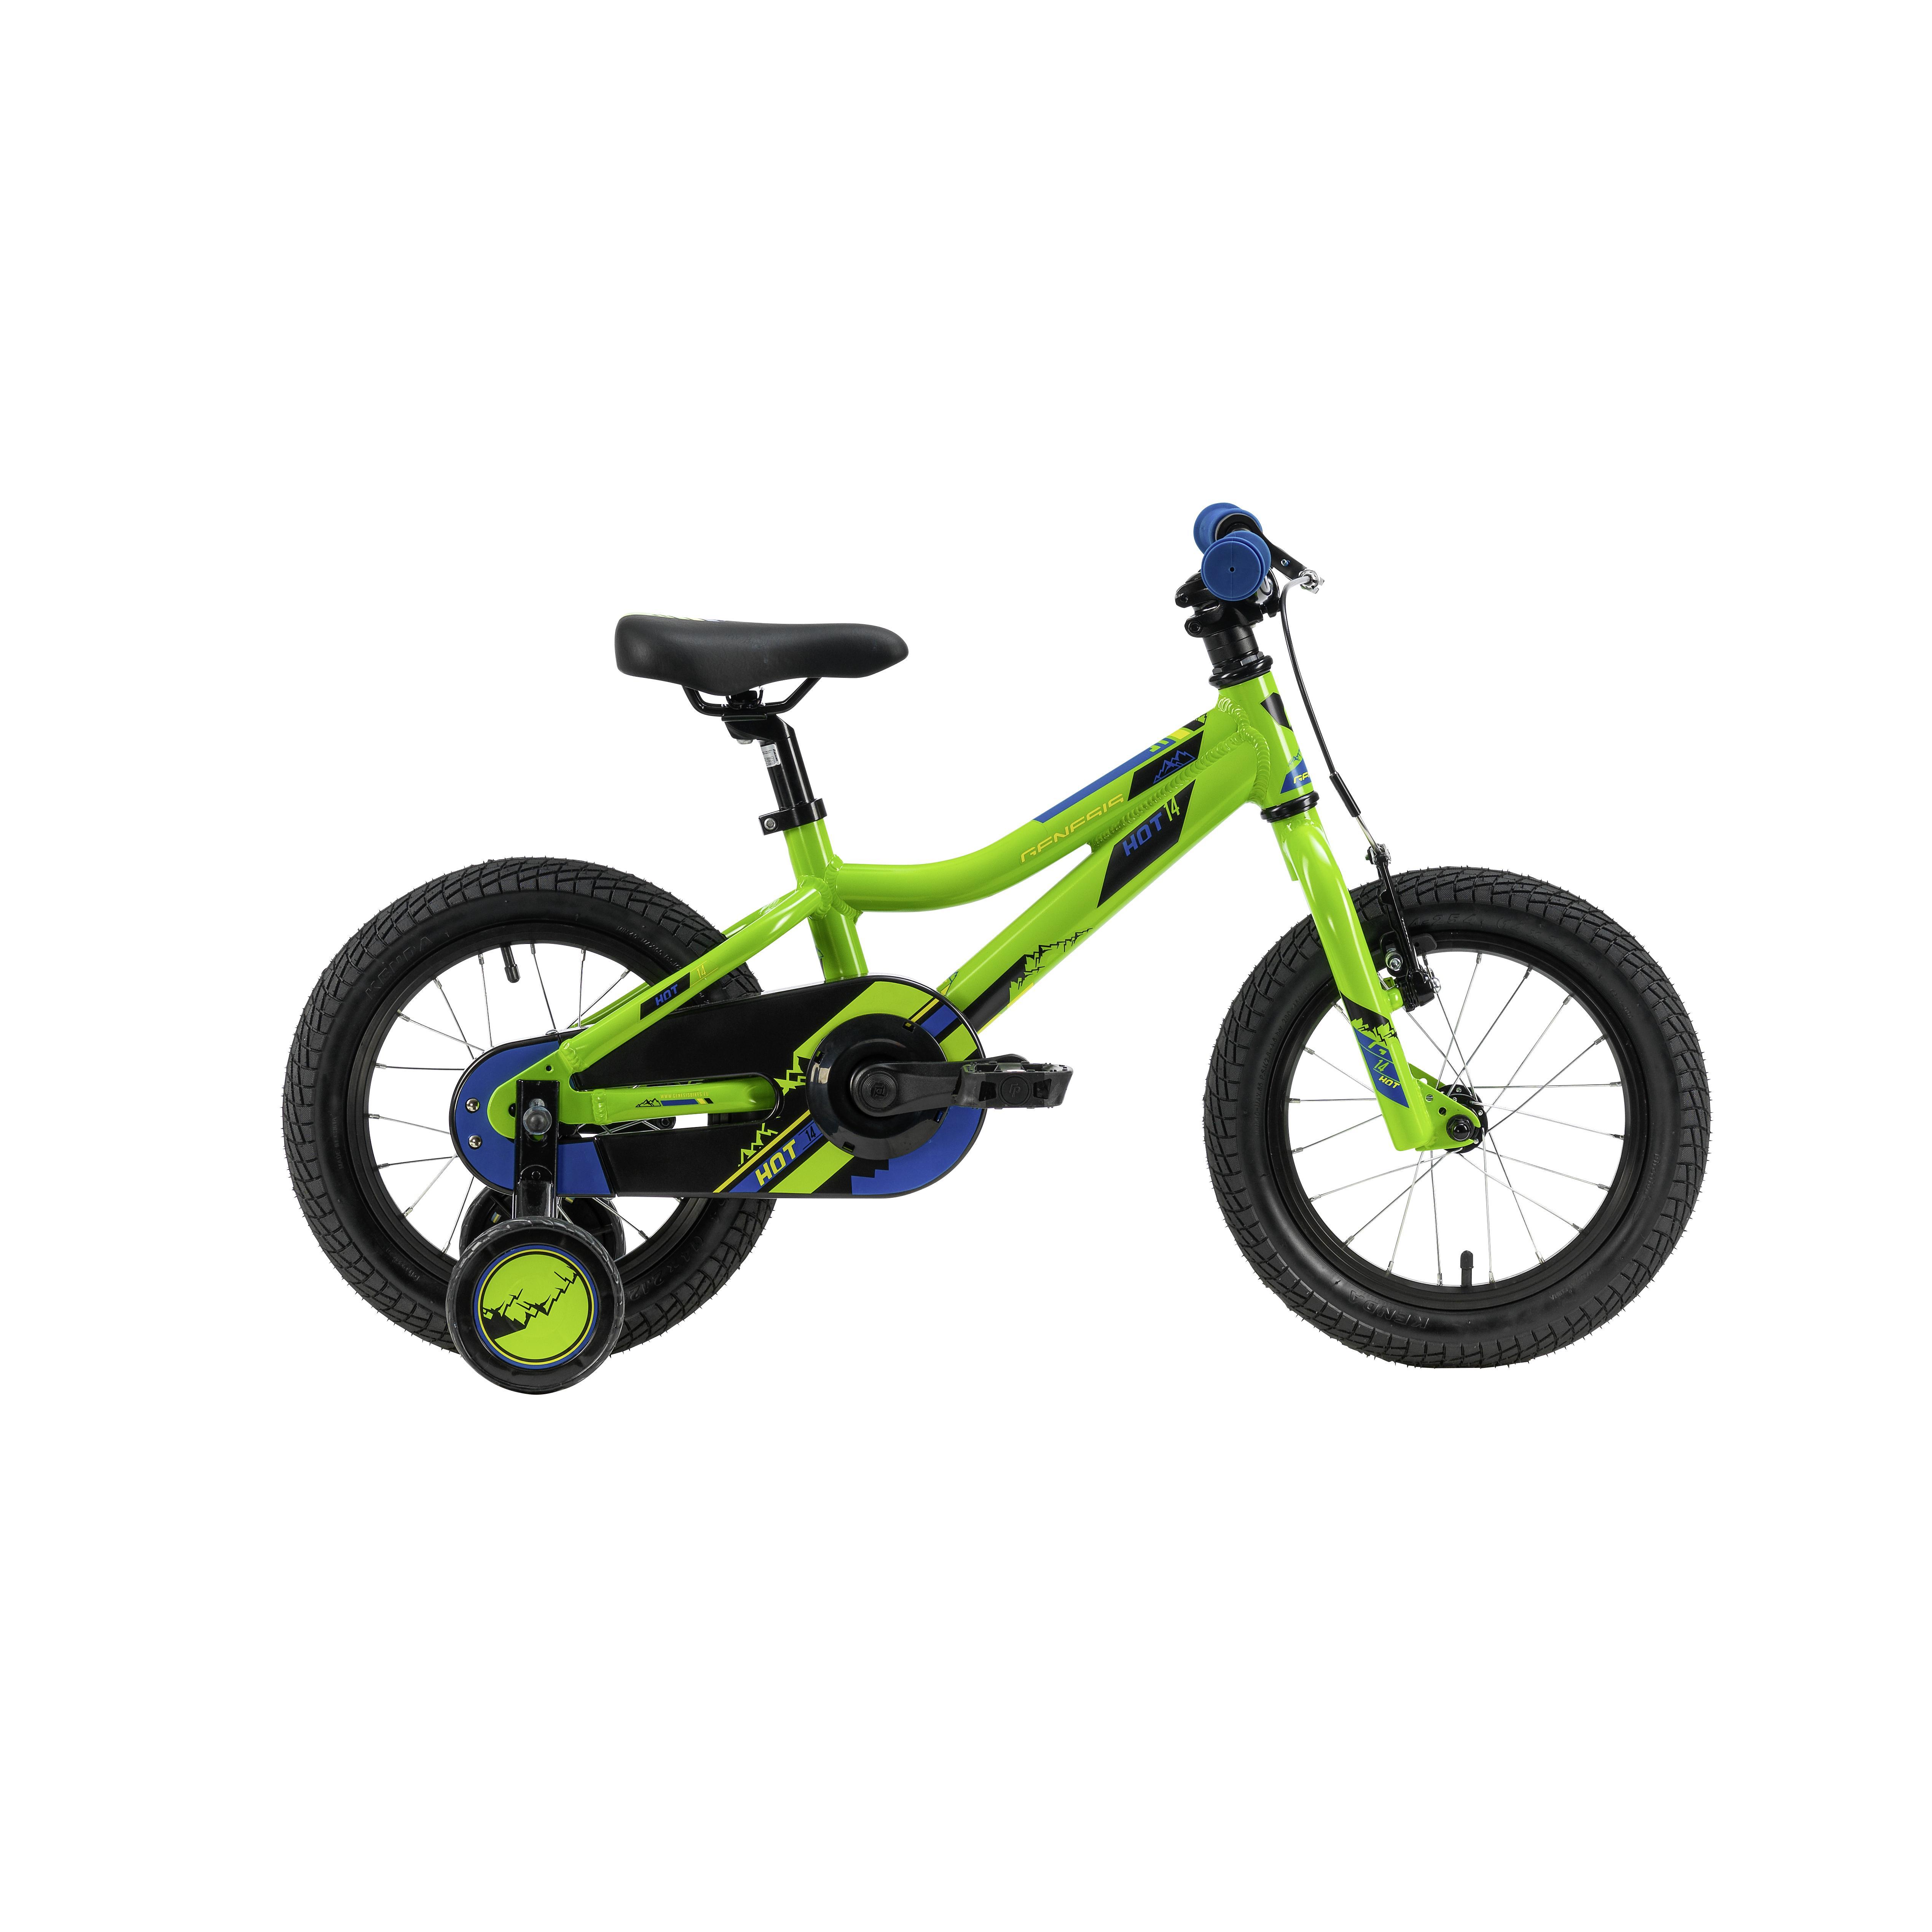 Genesis HOT 14, dječji bicikl, zelena